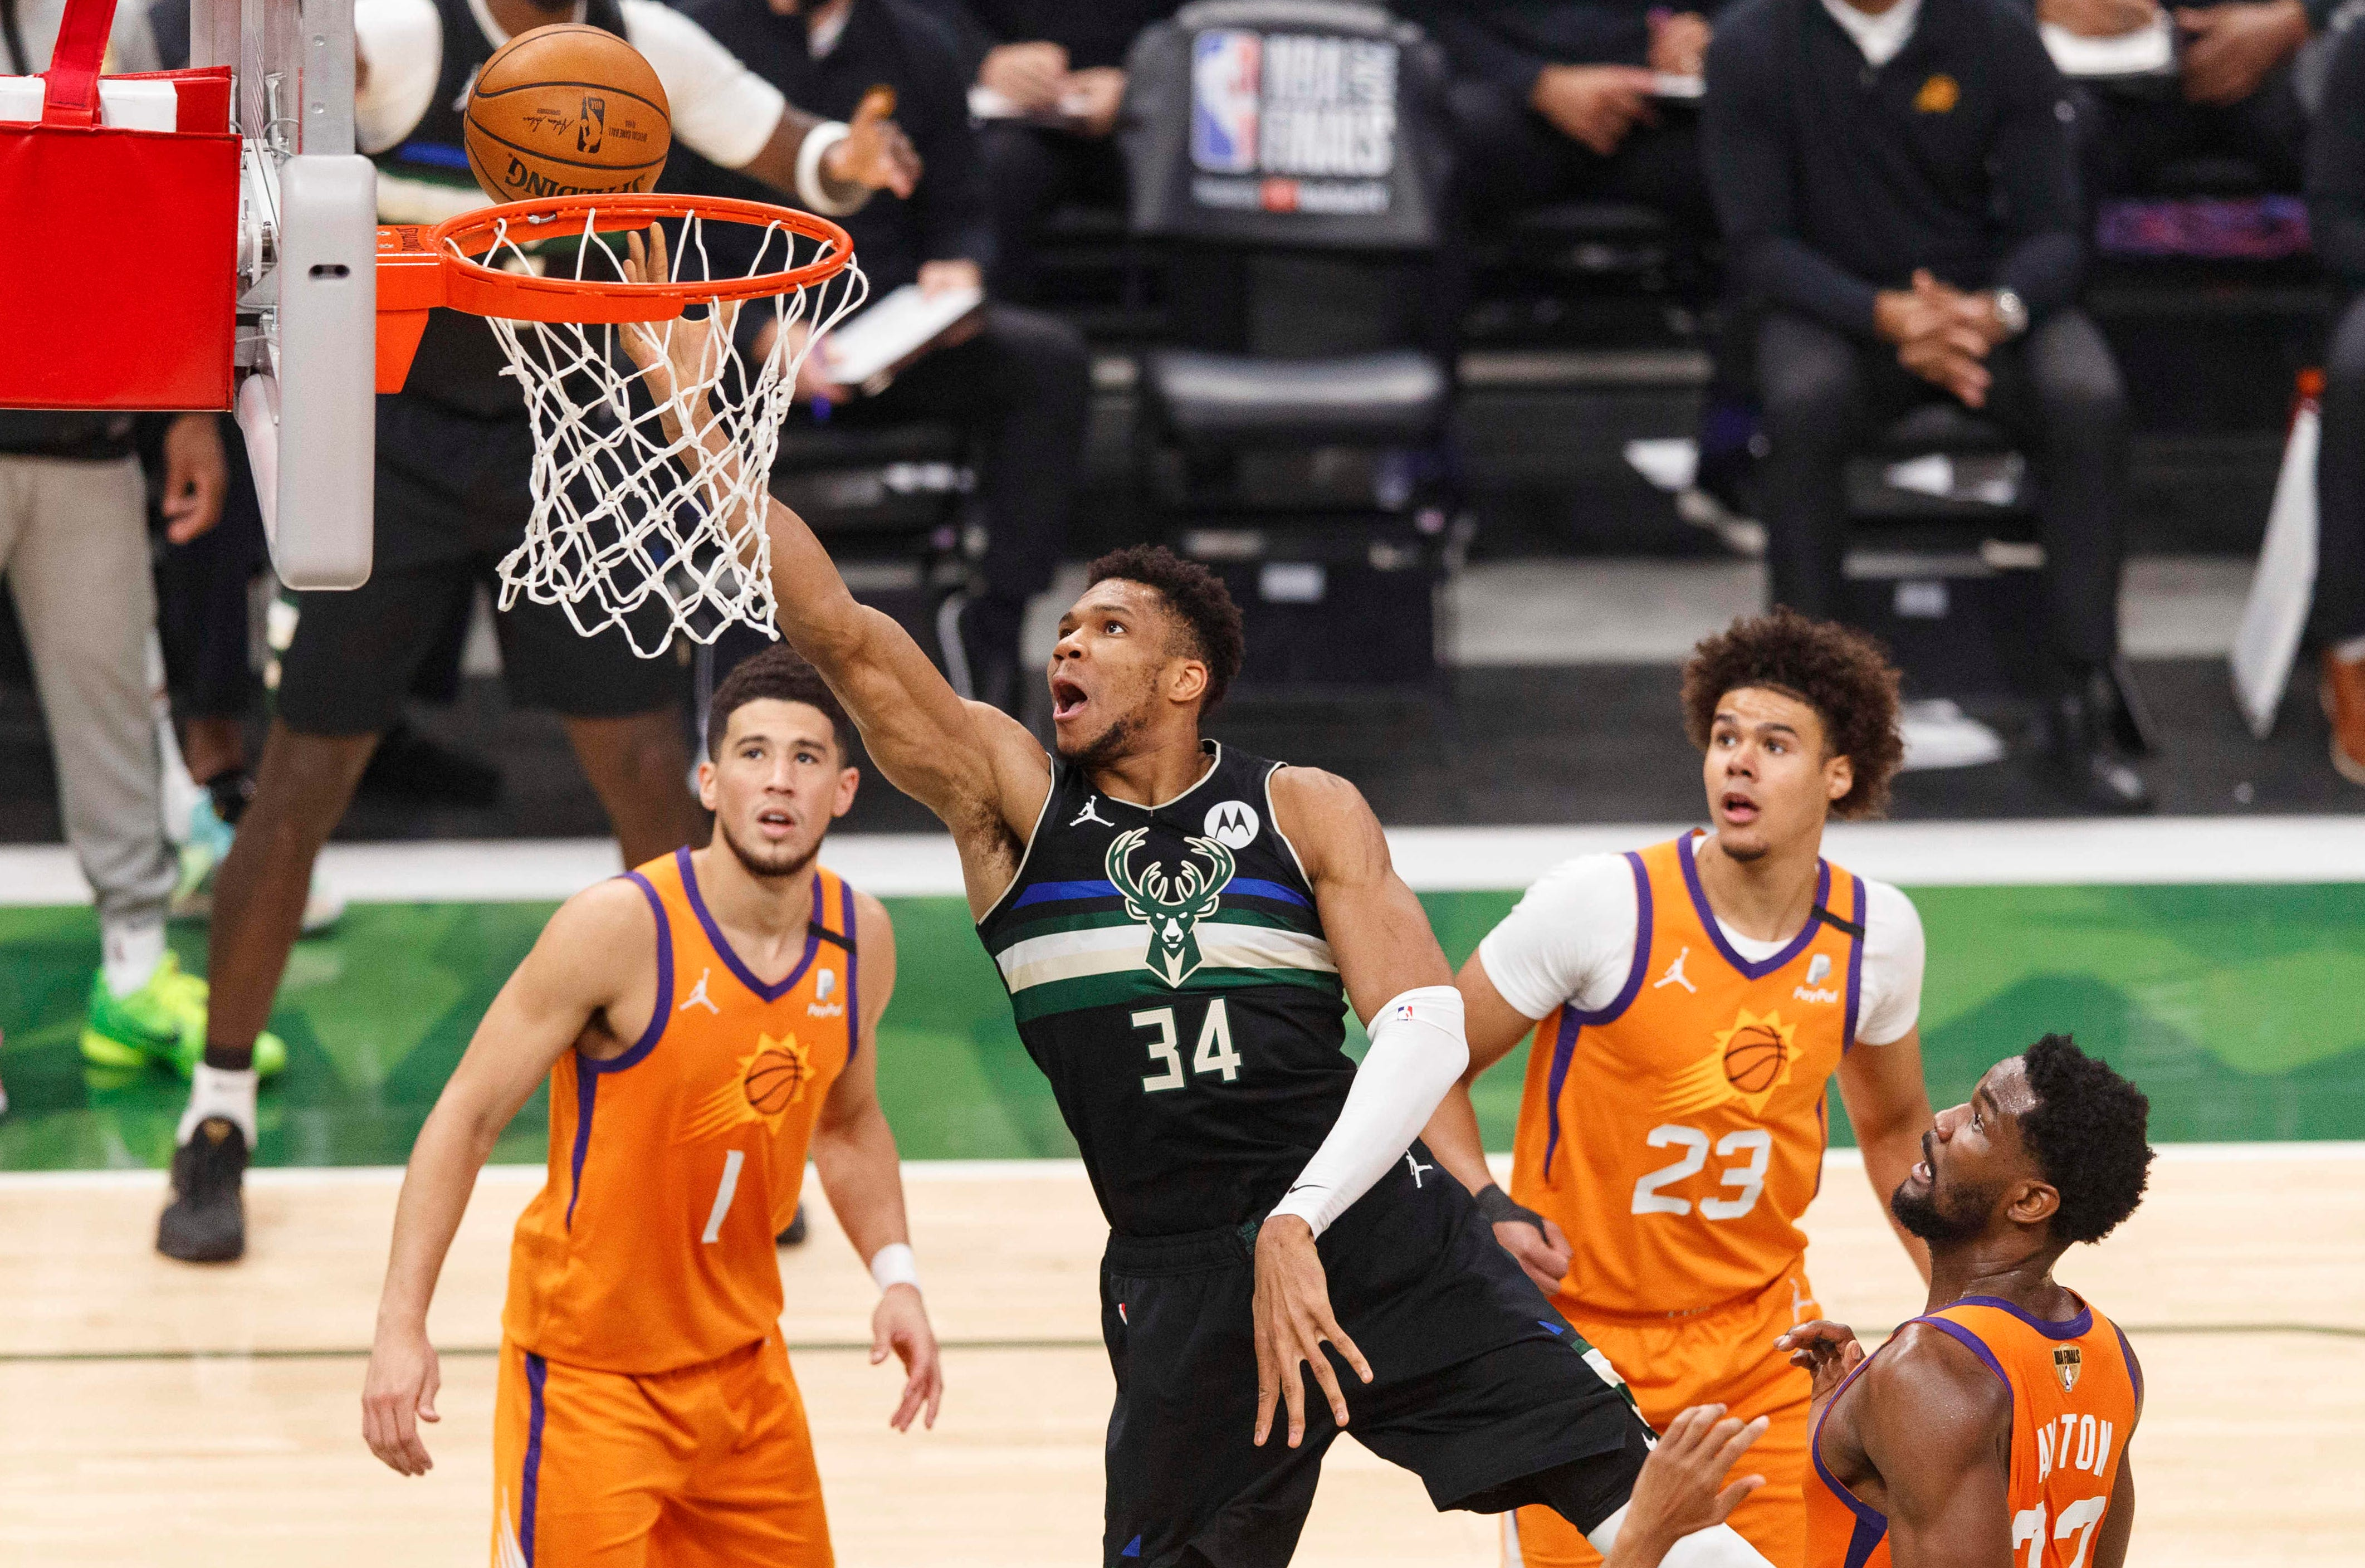 Milwaukee Bucks' Giannis Antetokounmpo is named MVP of NBA Finals